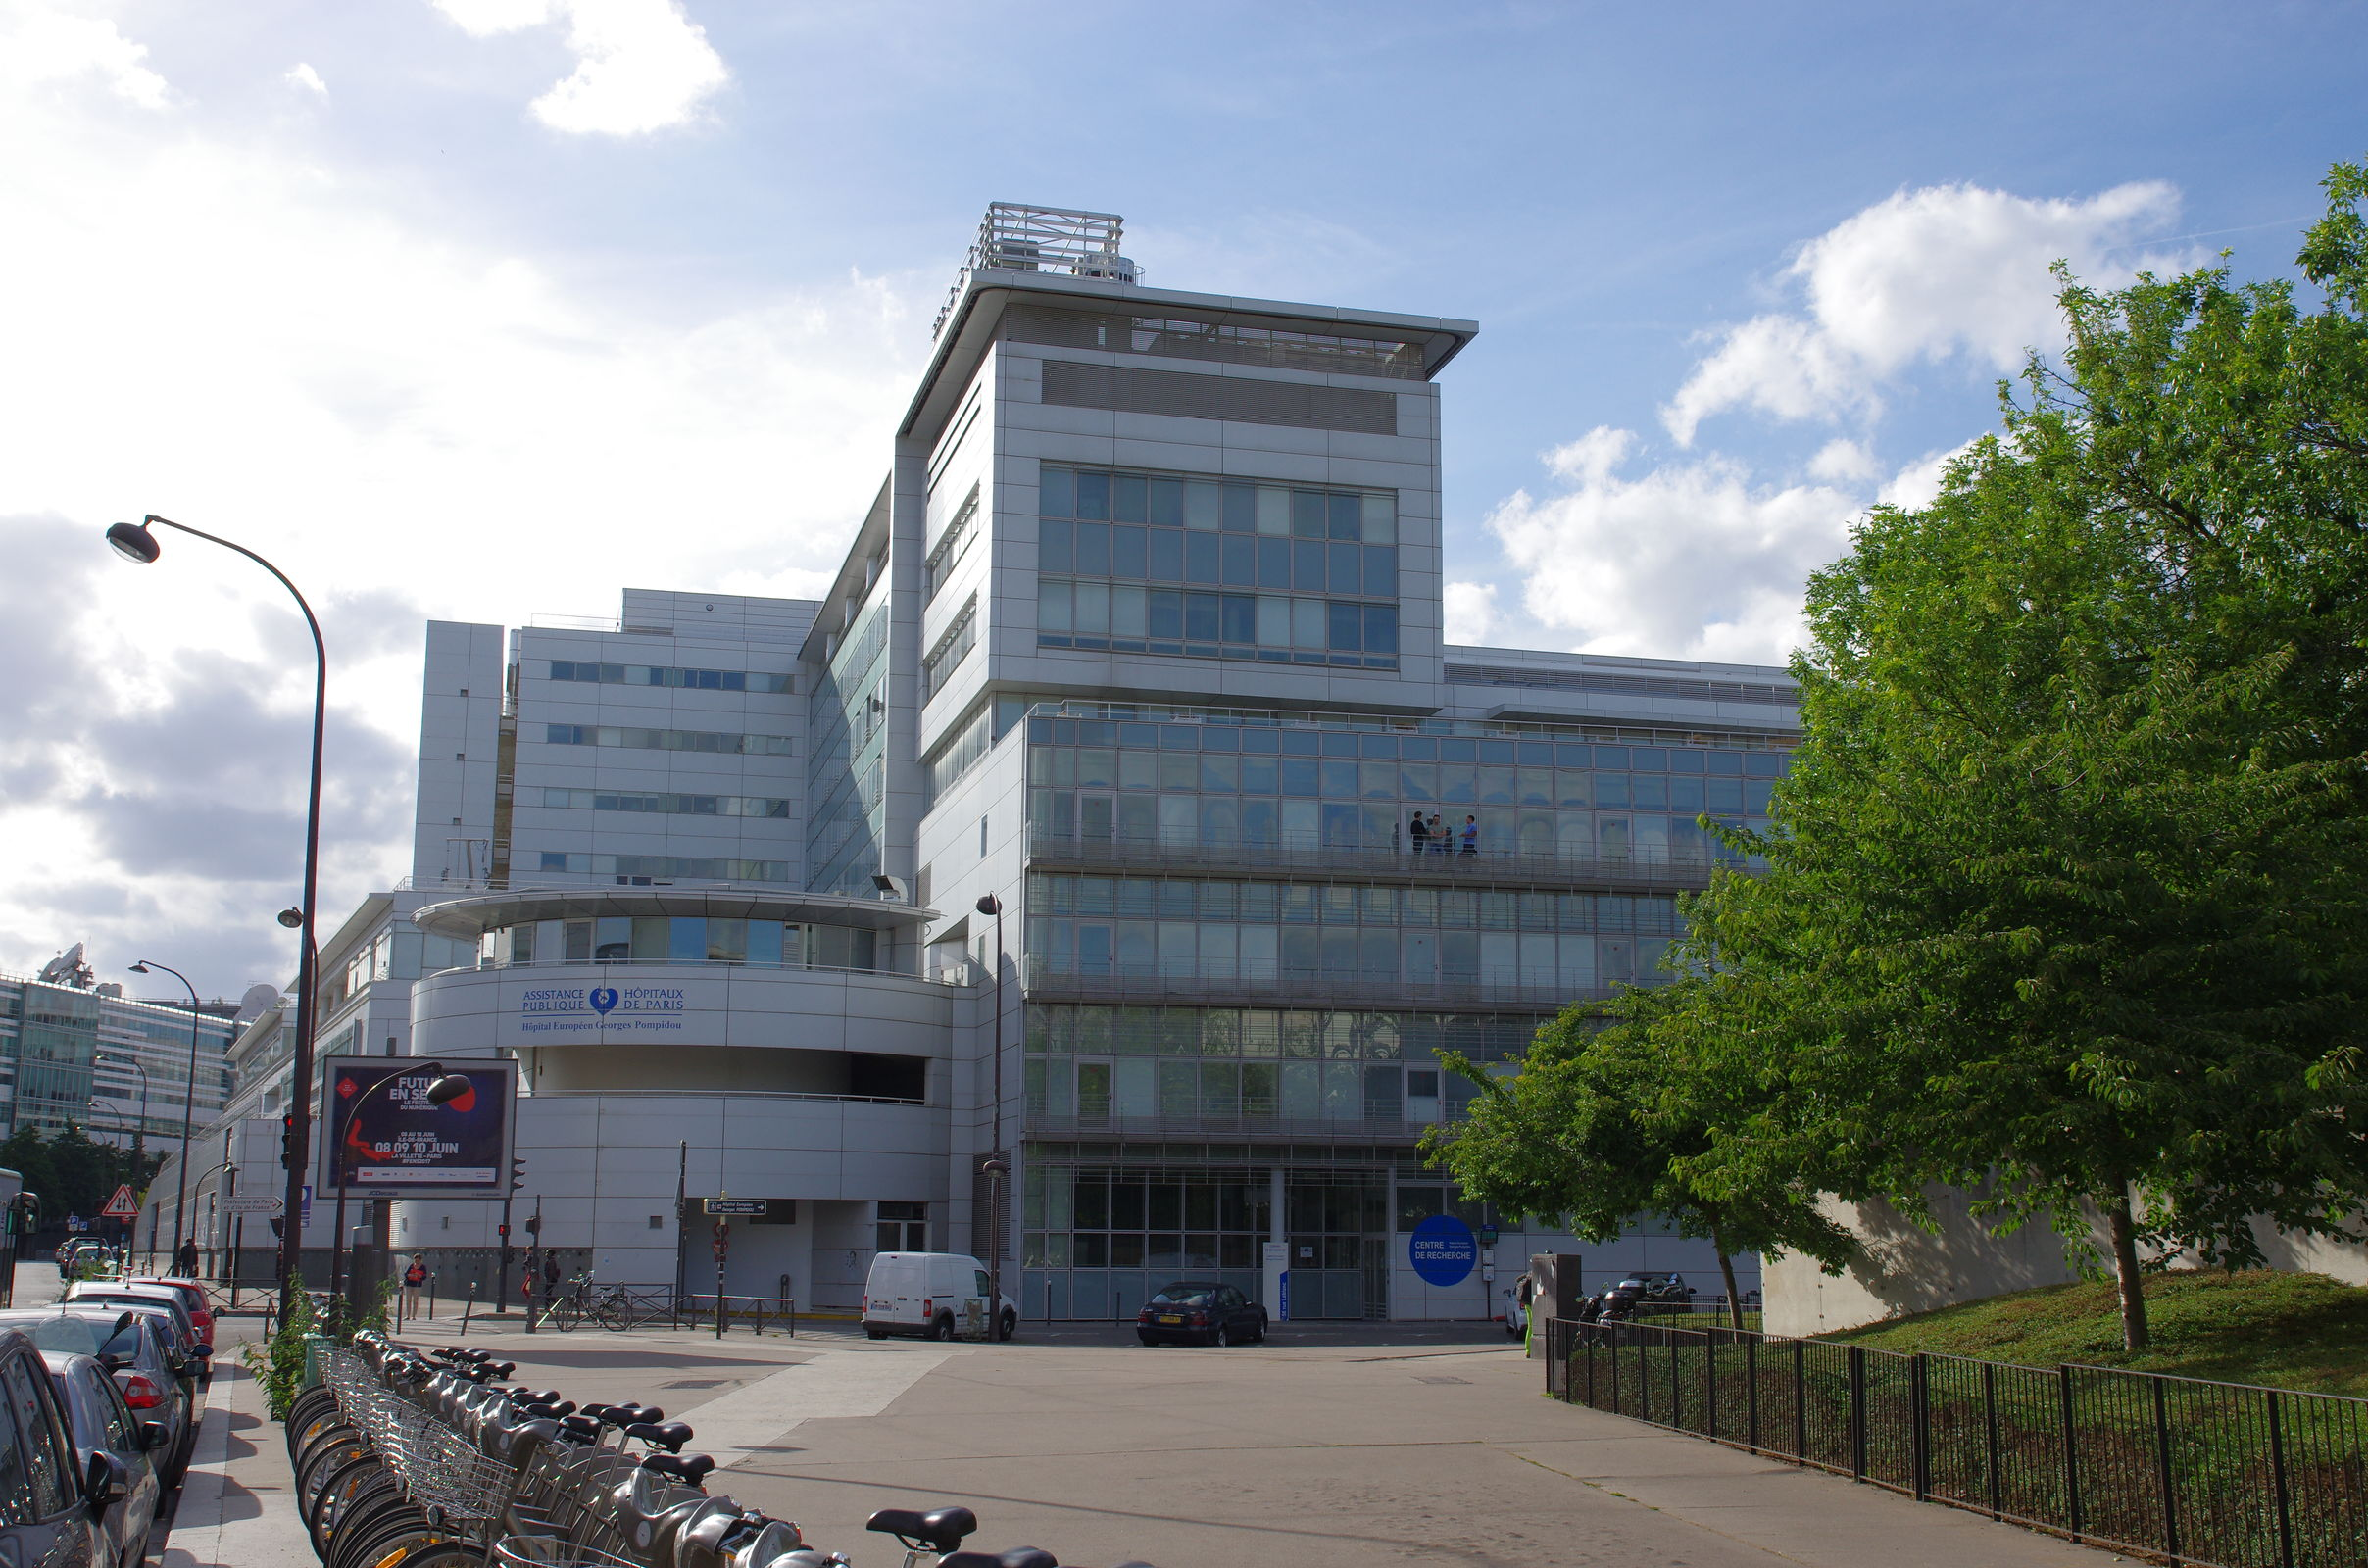 das Forschungsinstitut